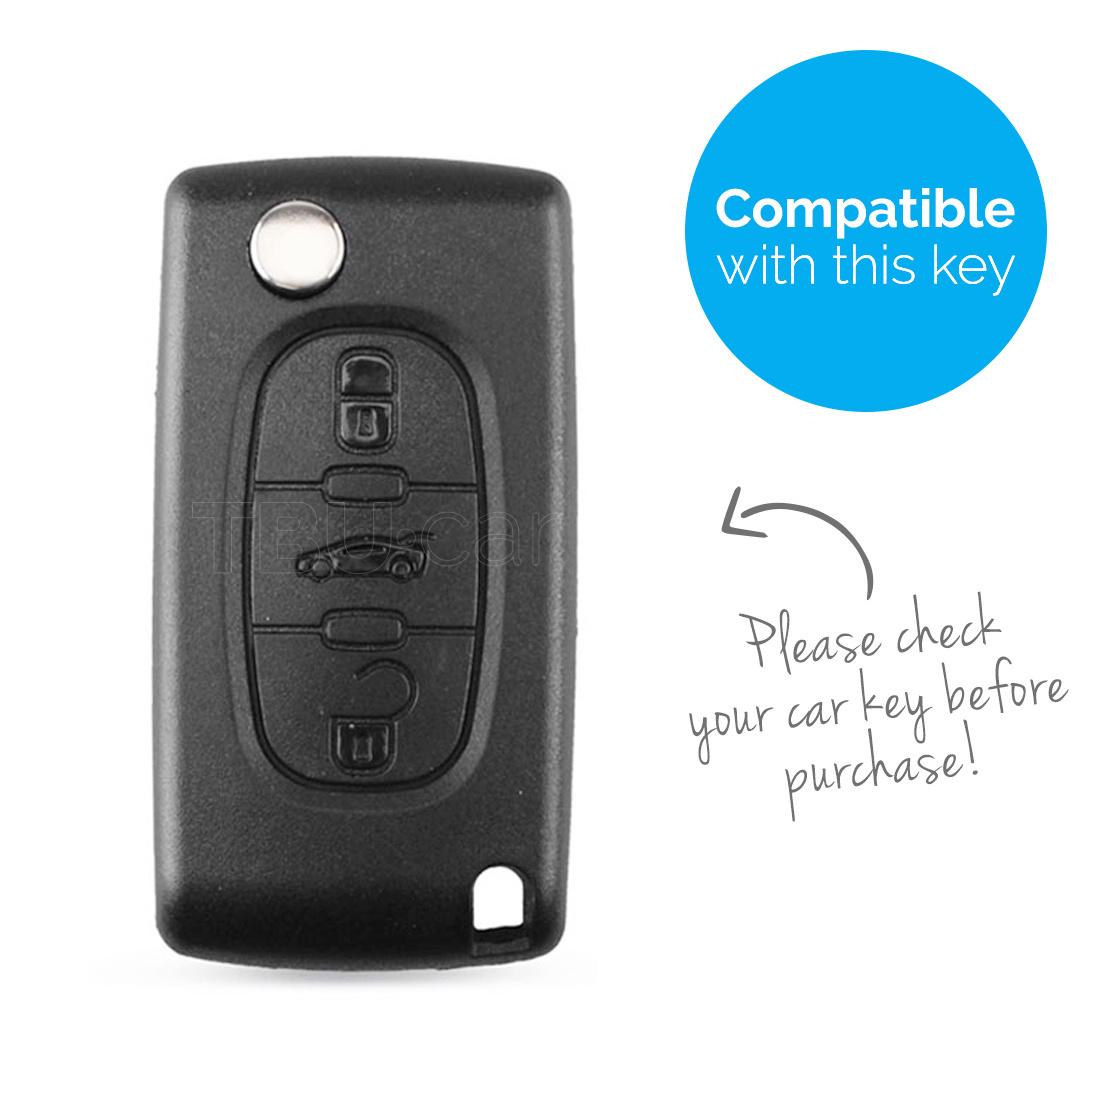 TBU car Autoschlüssel Hülle für Peugeot 3 Tasten - Schutzhülle aus Silikon - Auto Schlüsselhülle Cover in Violett